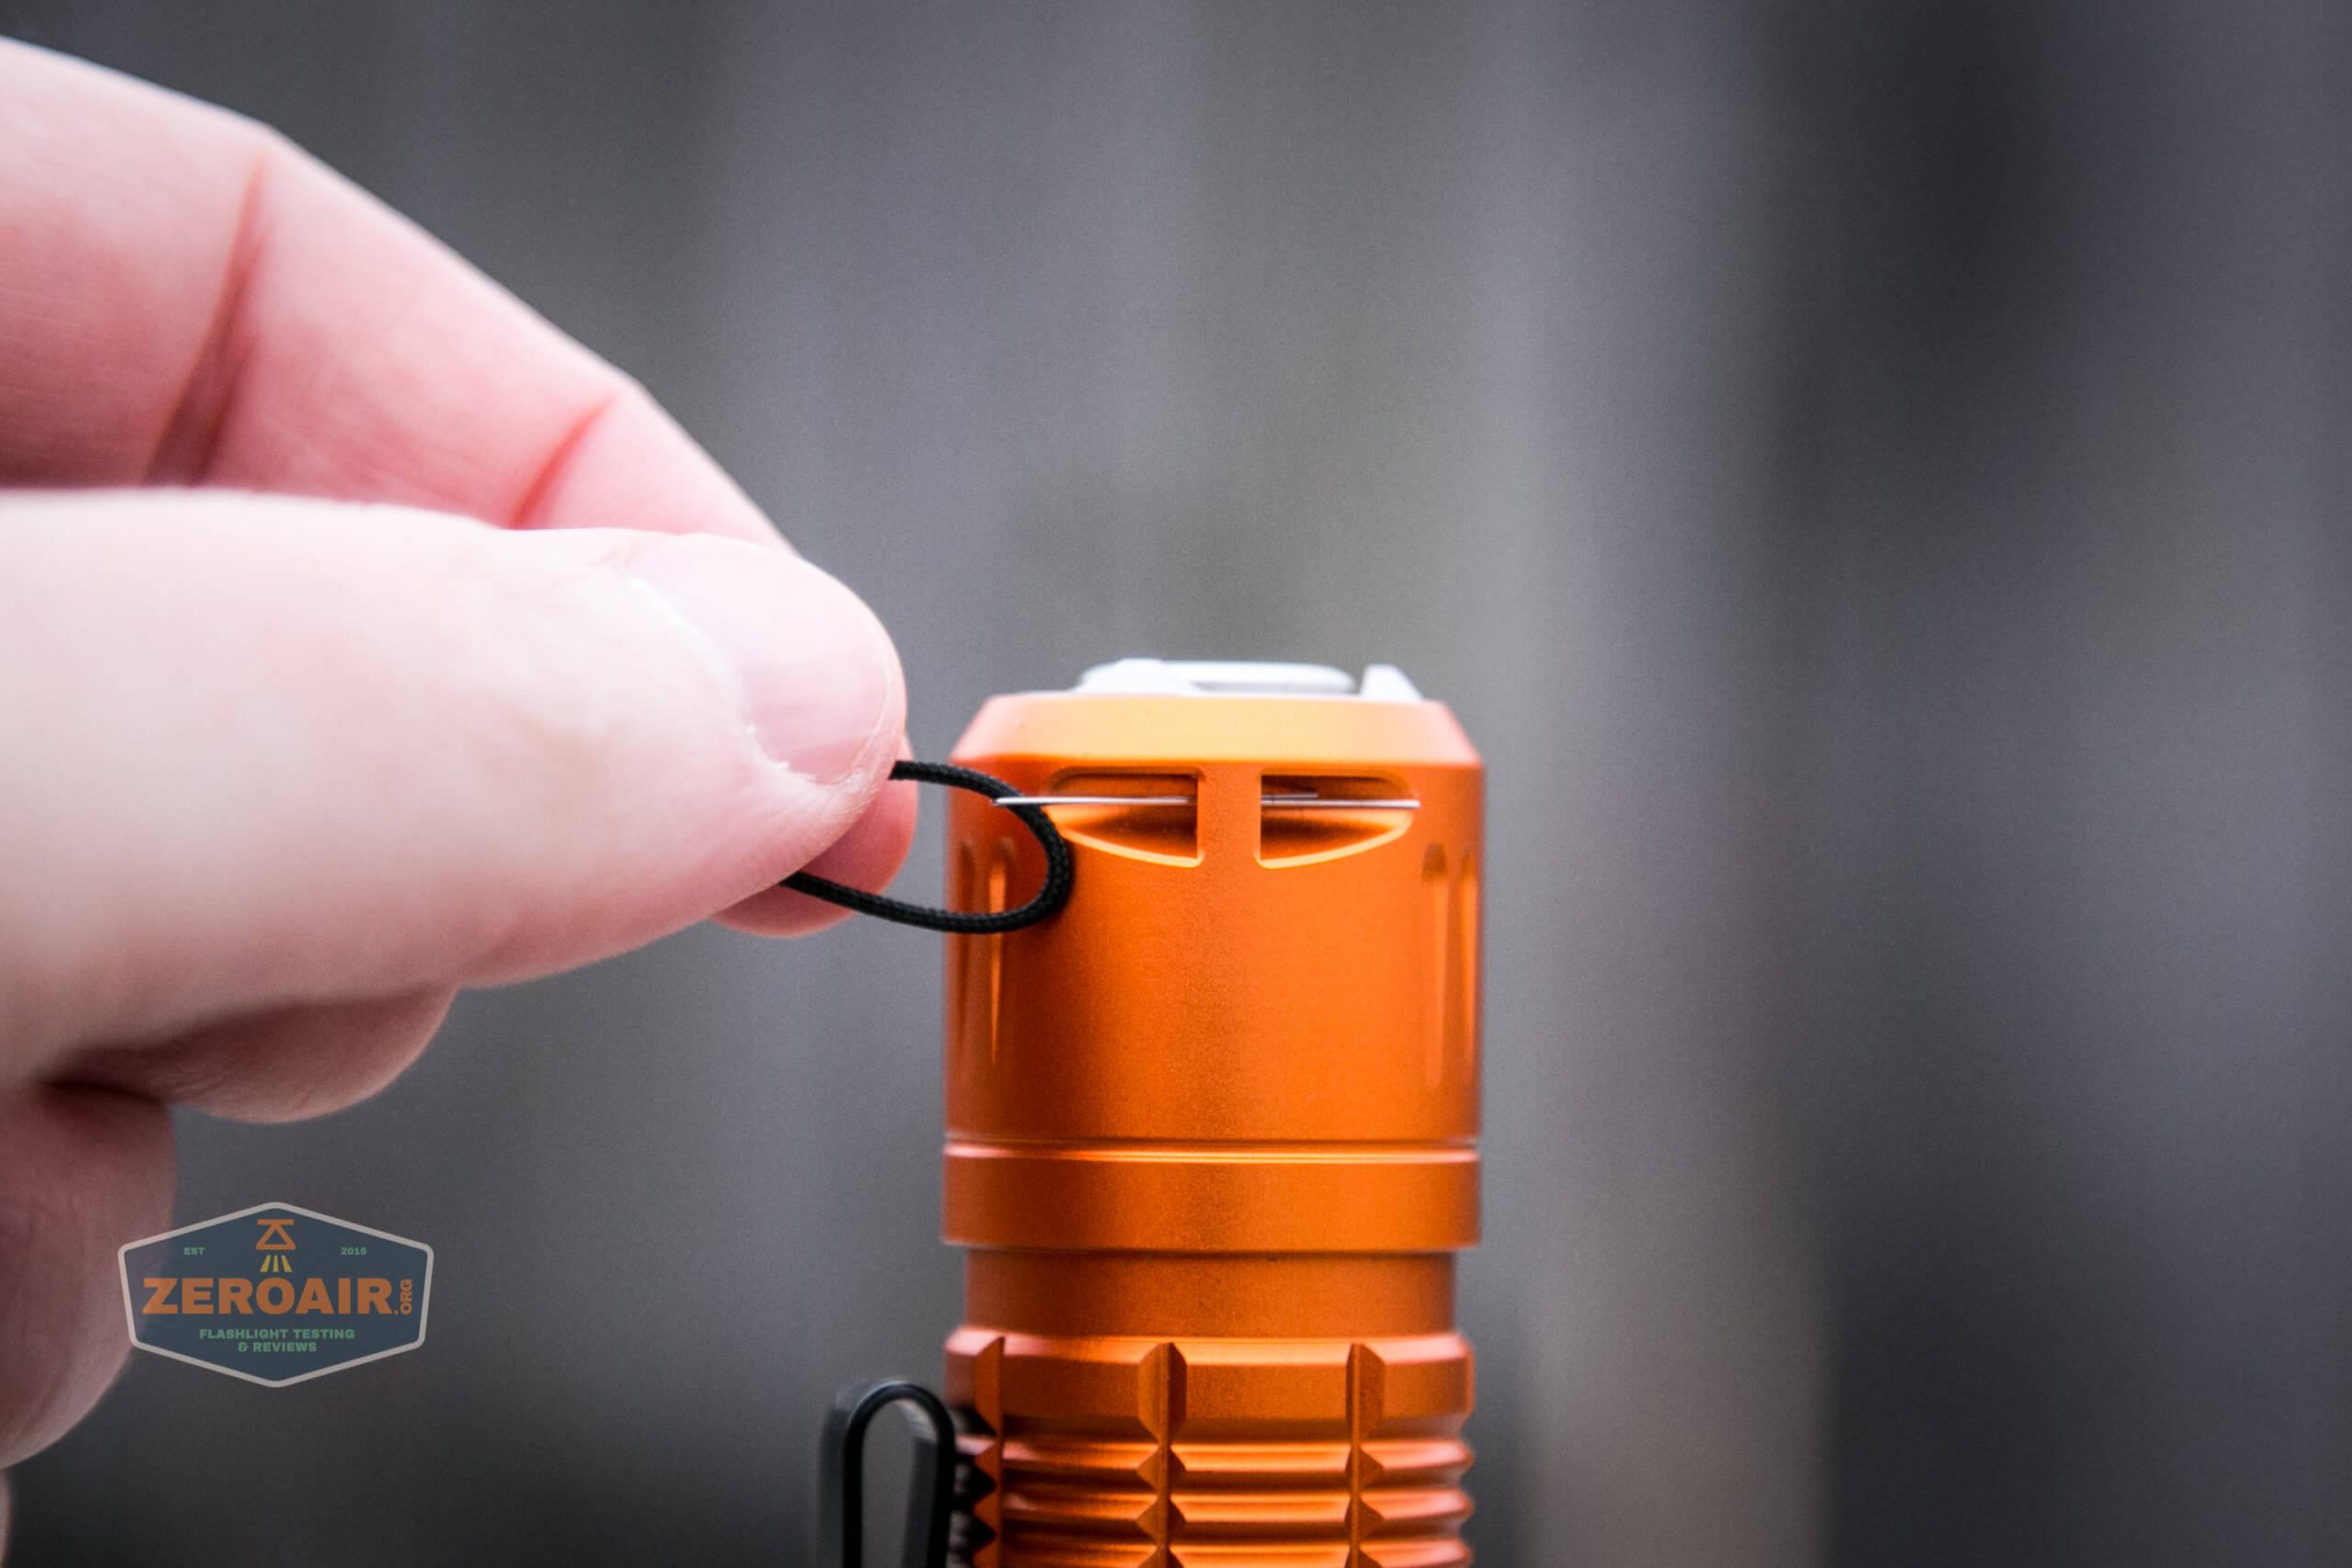 Olight M2R Pro Warrior Orange lanyard installing